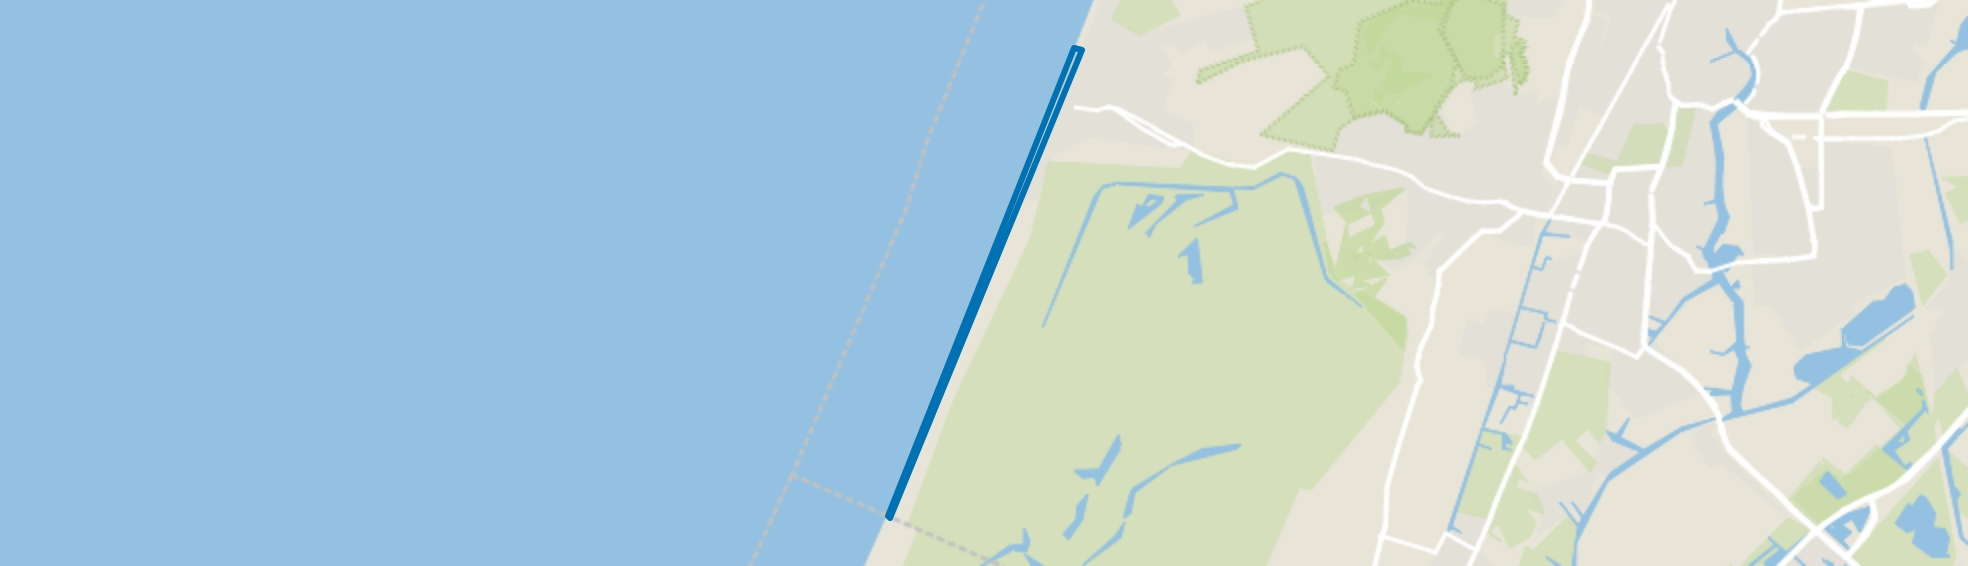 Zuid strand, Zandvoort map